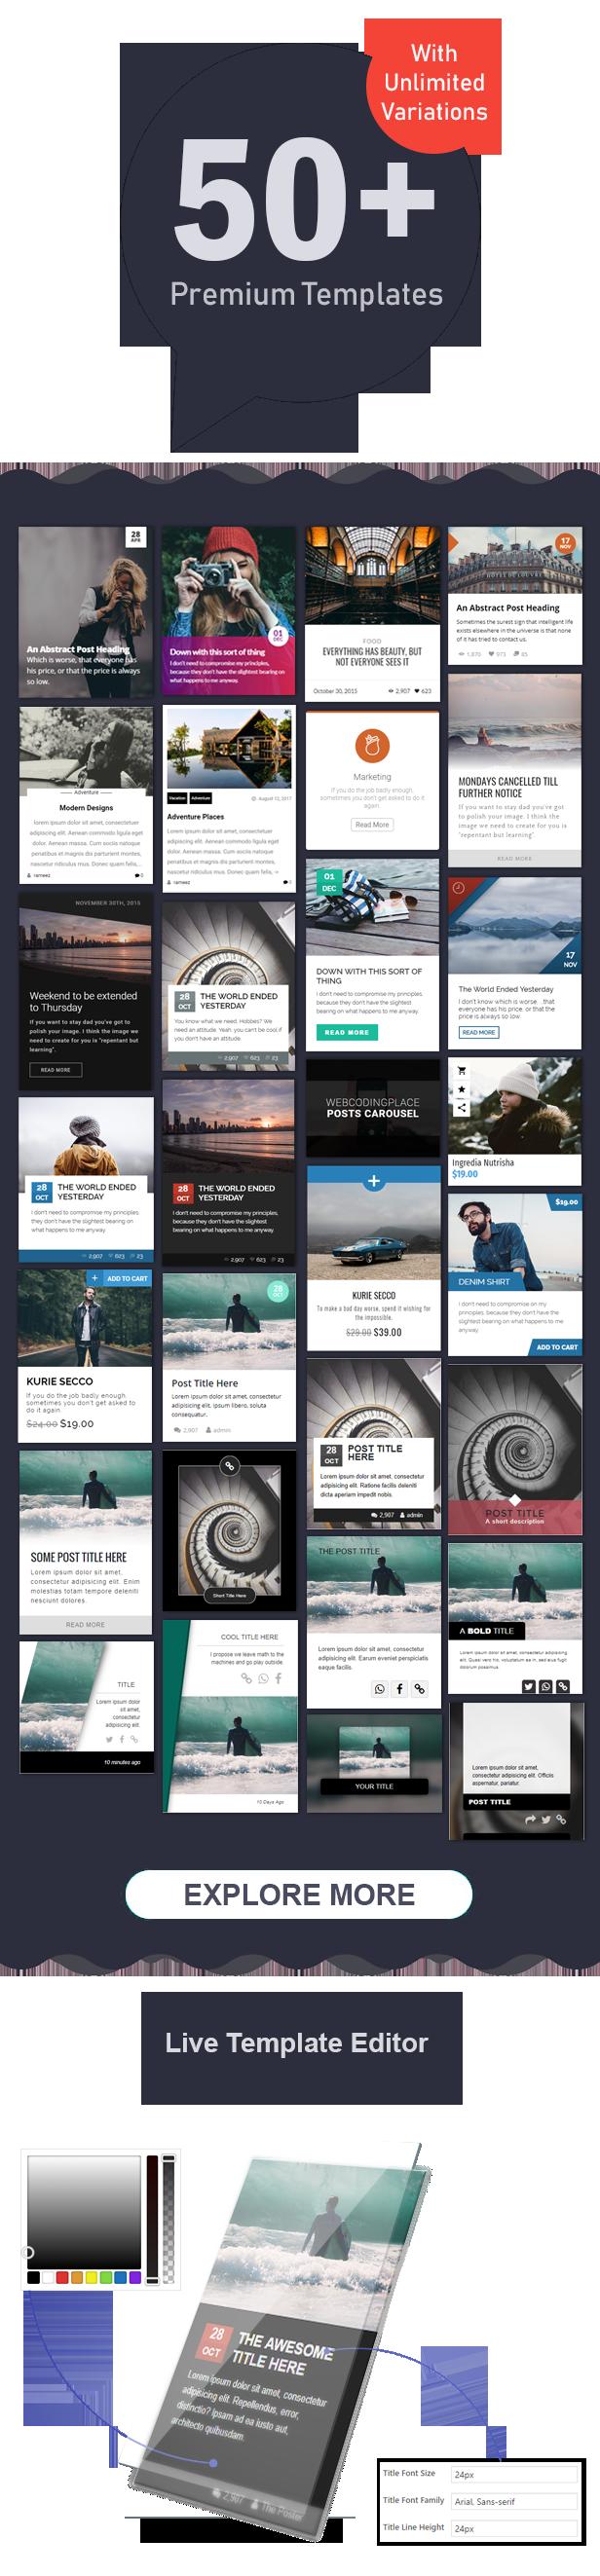 Responsive Posts Carousel WordPress Plugin - 6